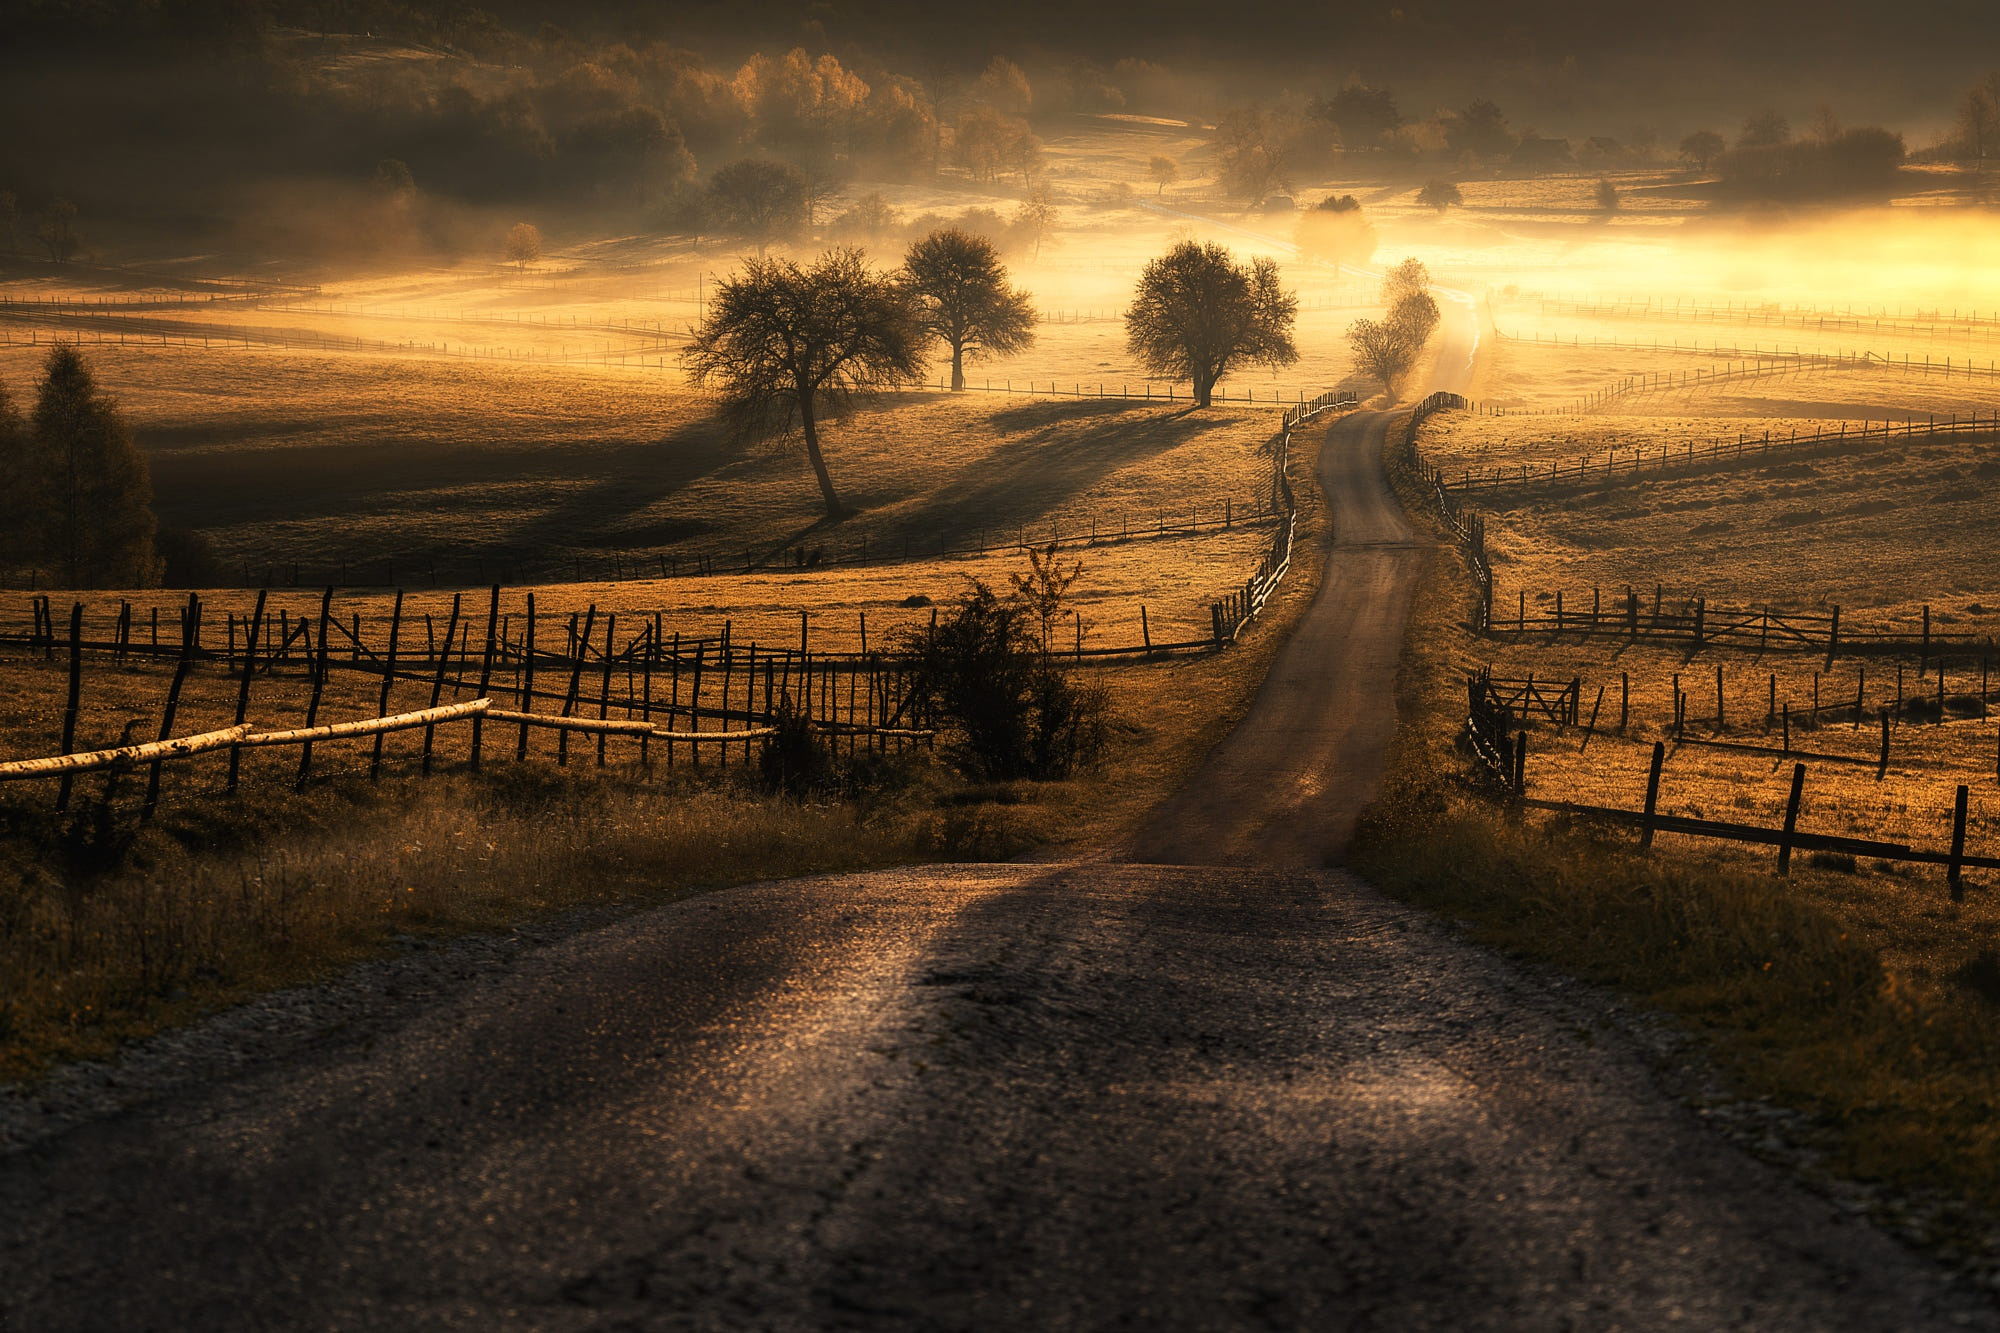 Fog Landscape Nature Road 2000x1333